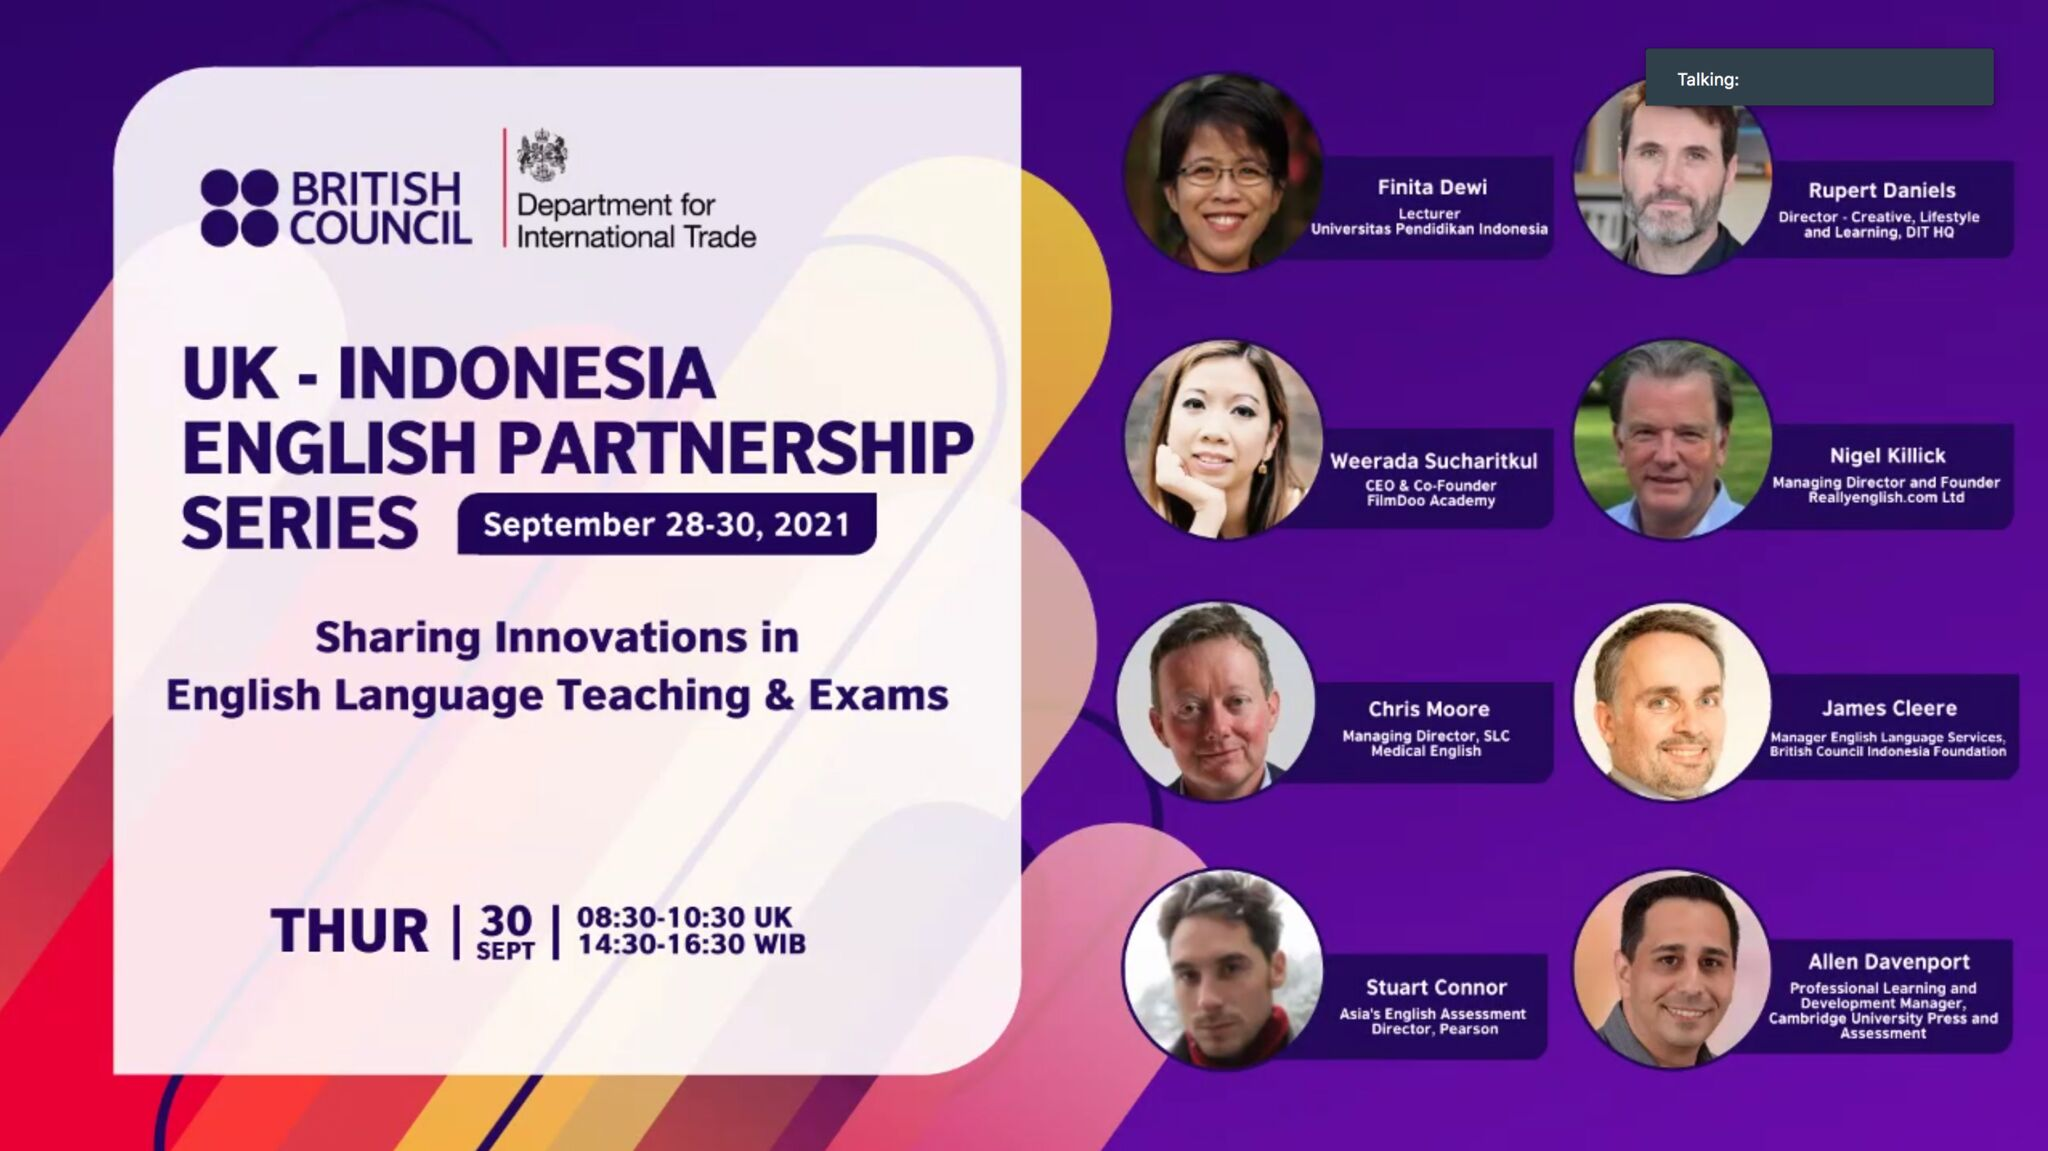 SLC UK-INDONESIA EVENT